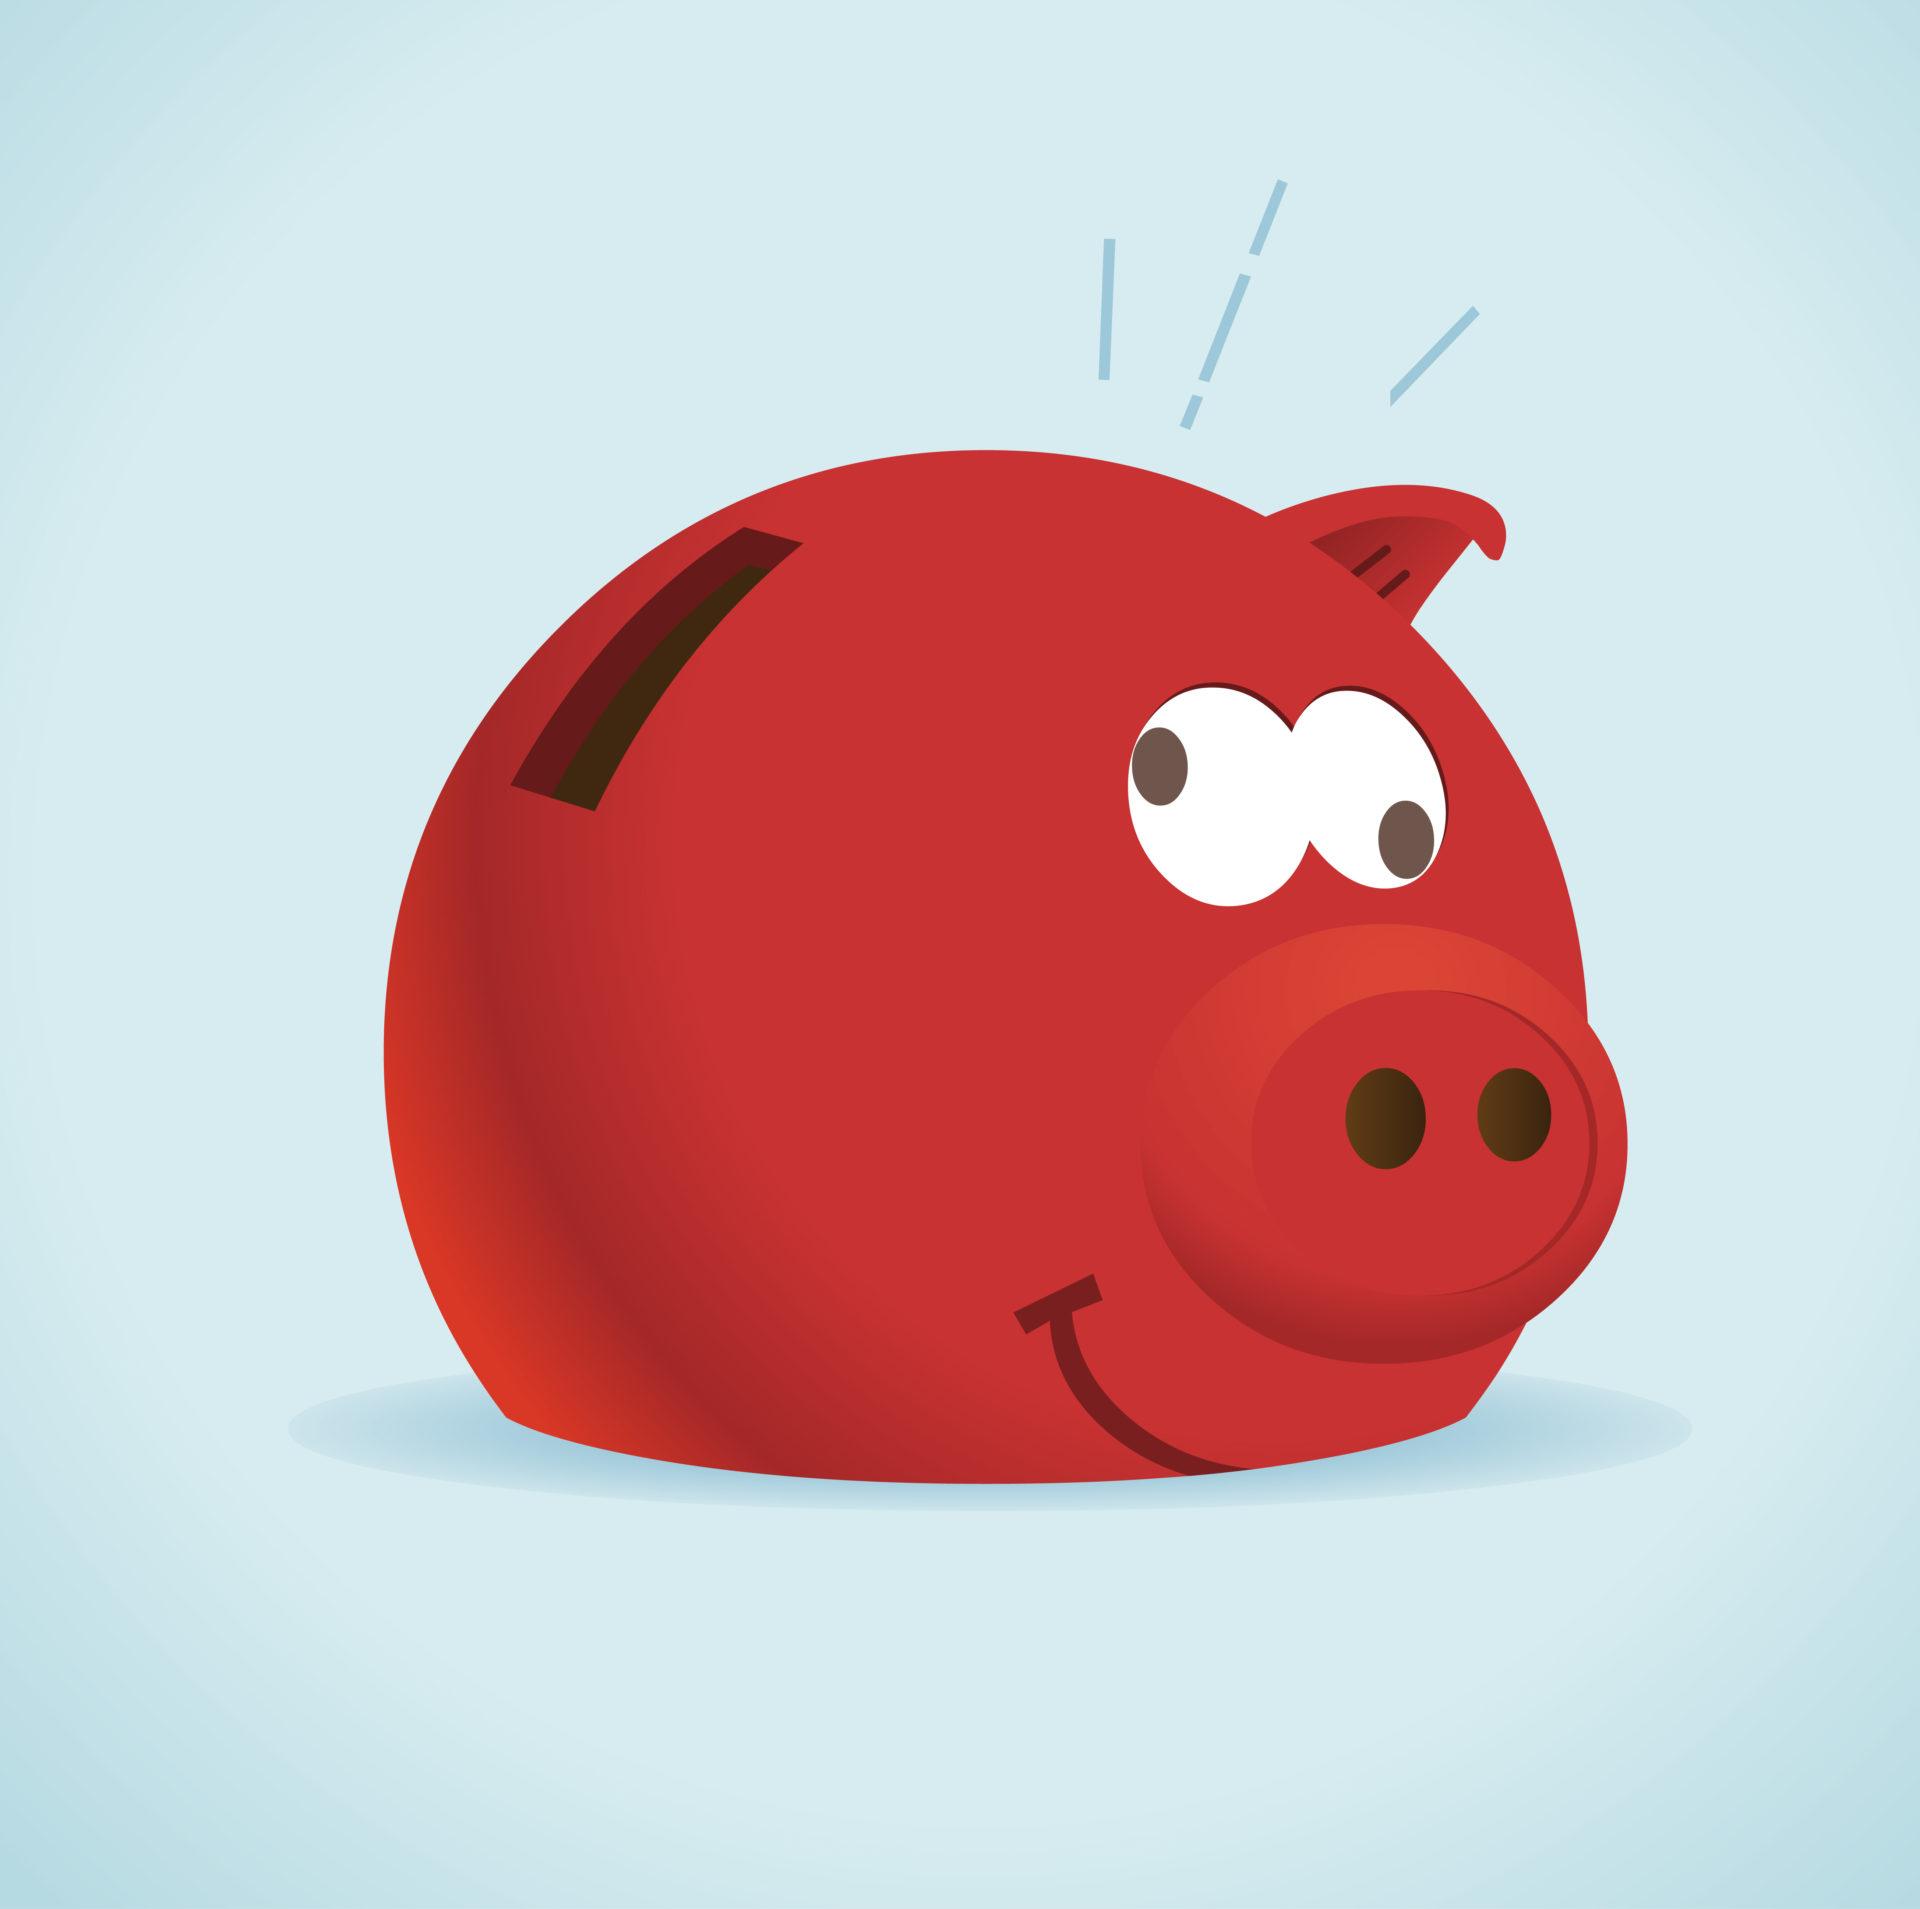 Red Piggy Bank. Vector illustration